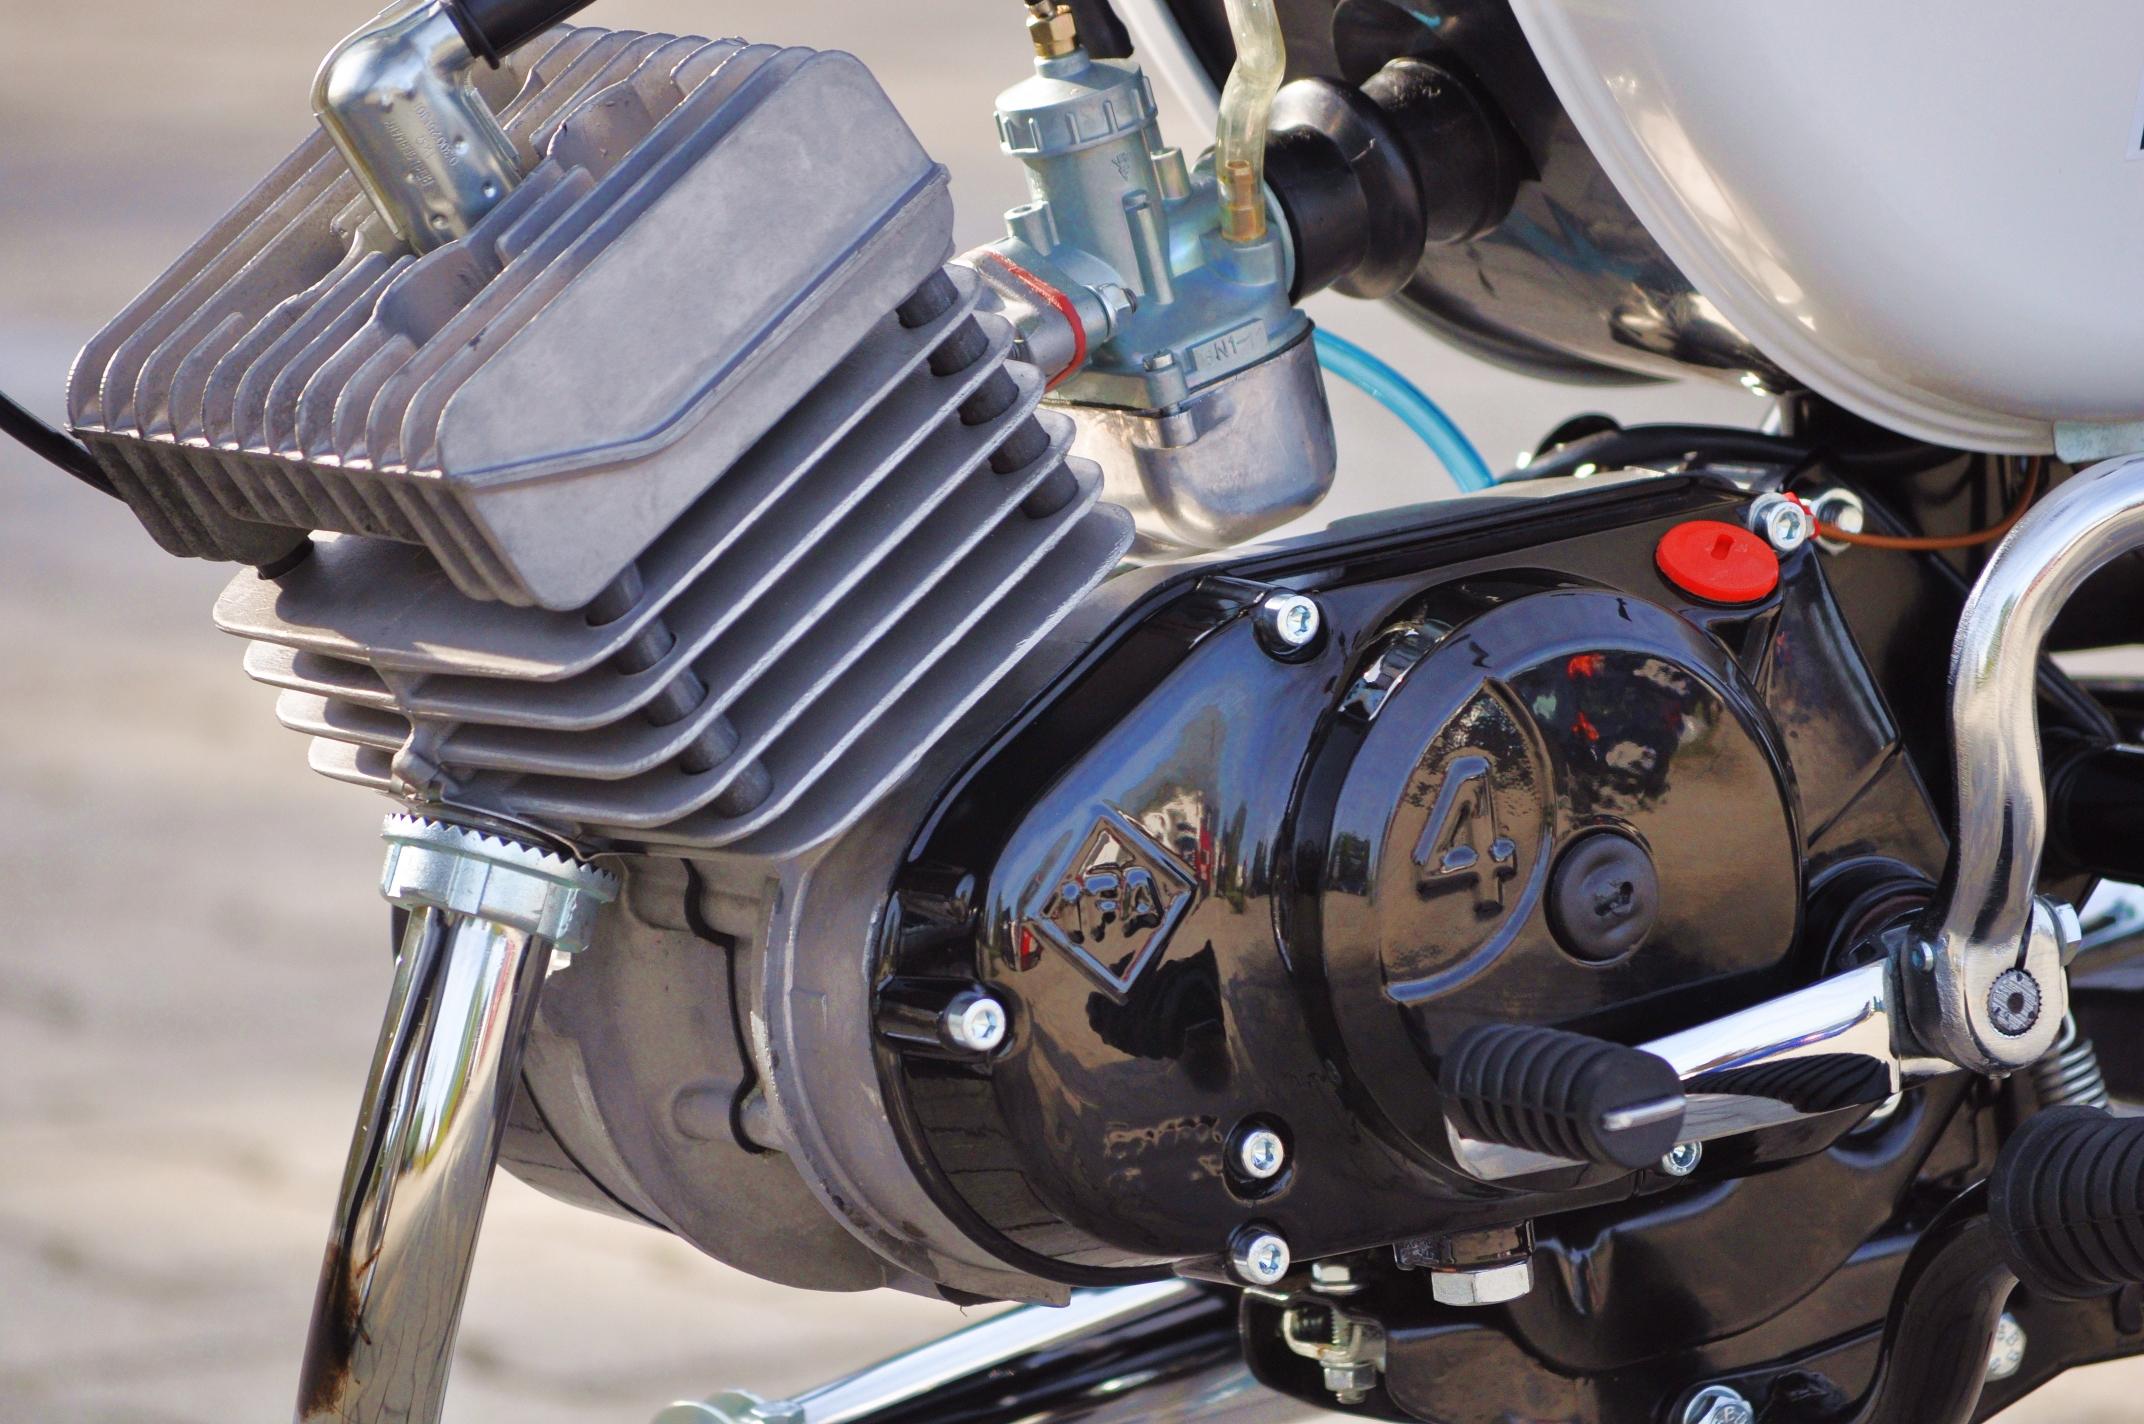 220 Berholung Motor Simson 4 Gang S51 Sr50 Kr51 2 Schwalbe